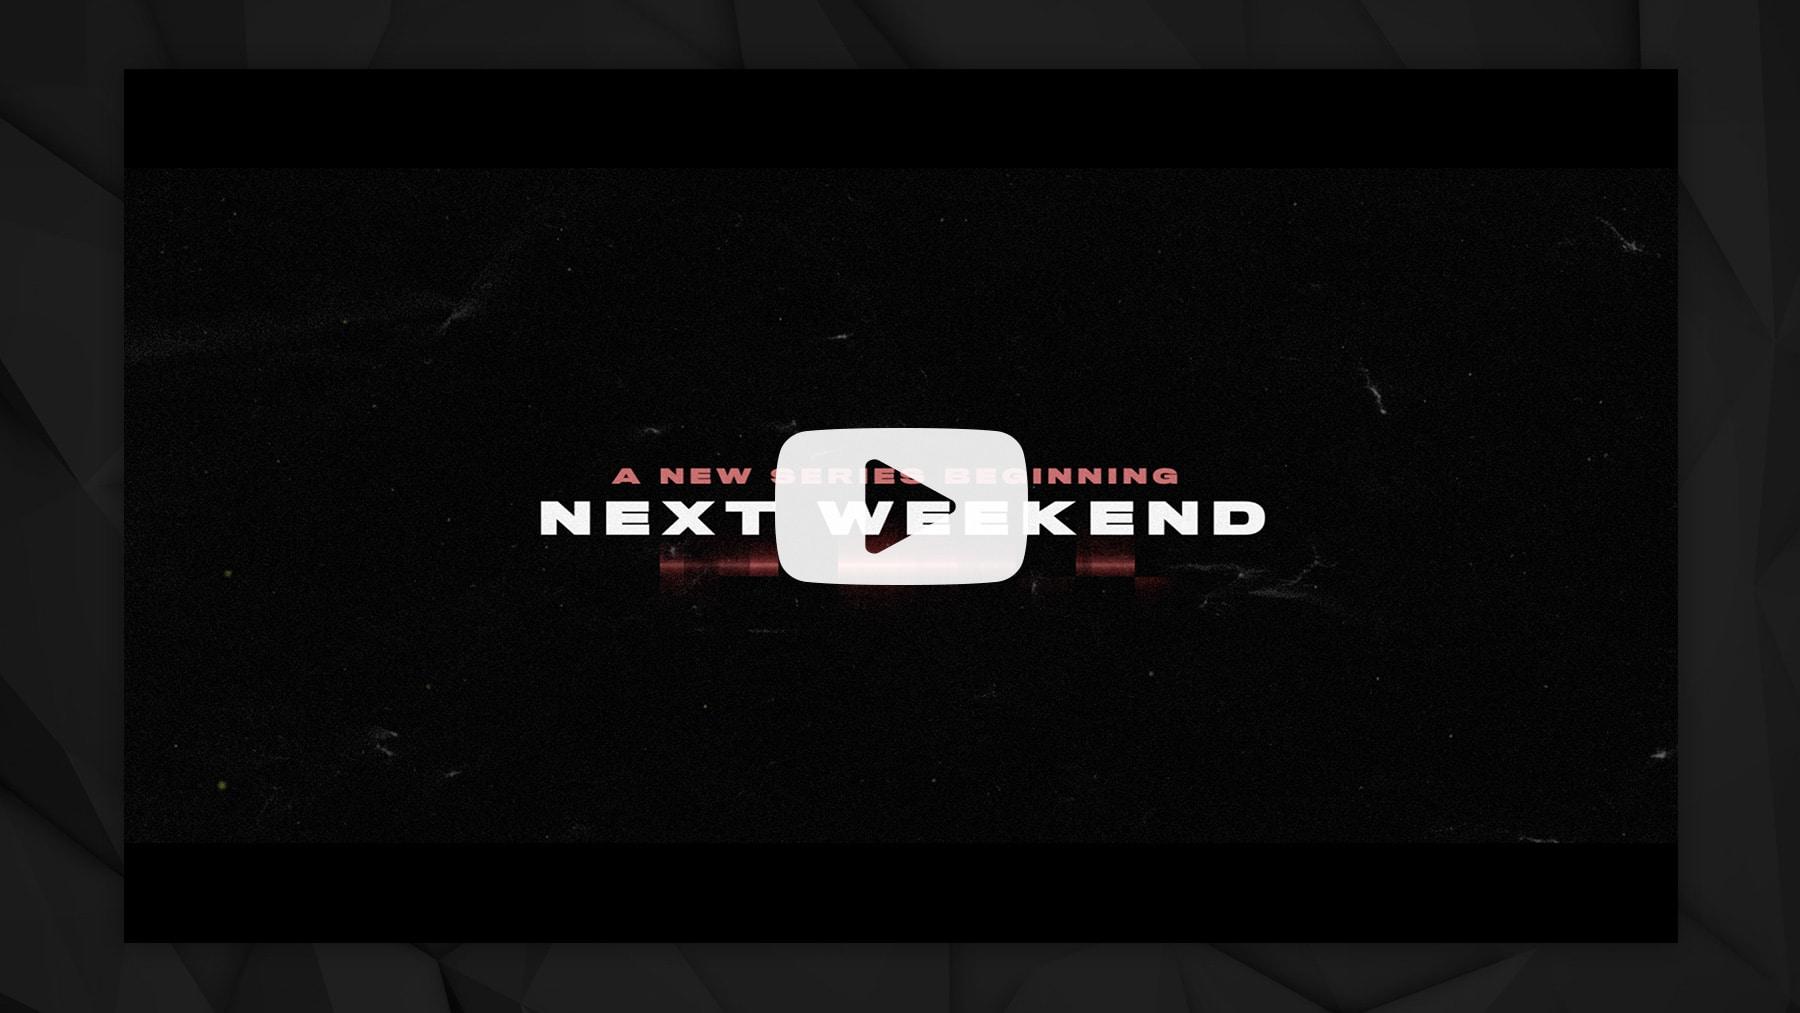 Usdk Trailer Video